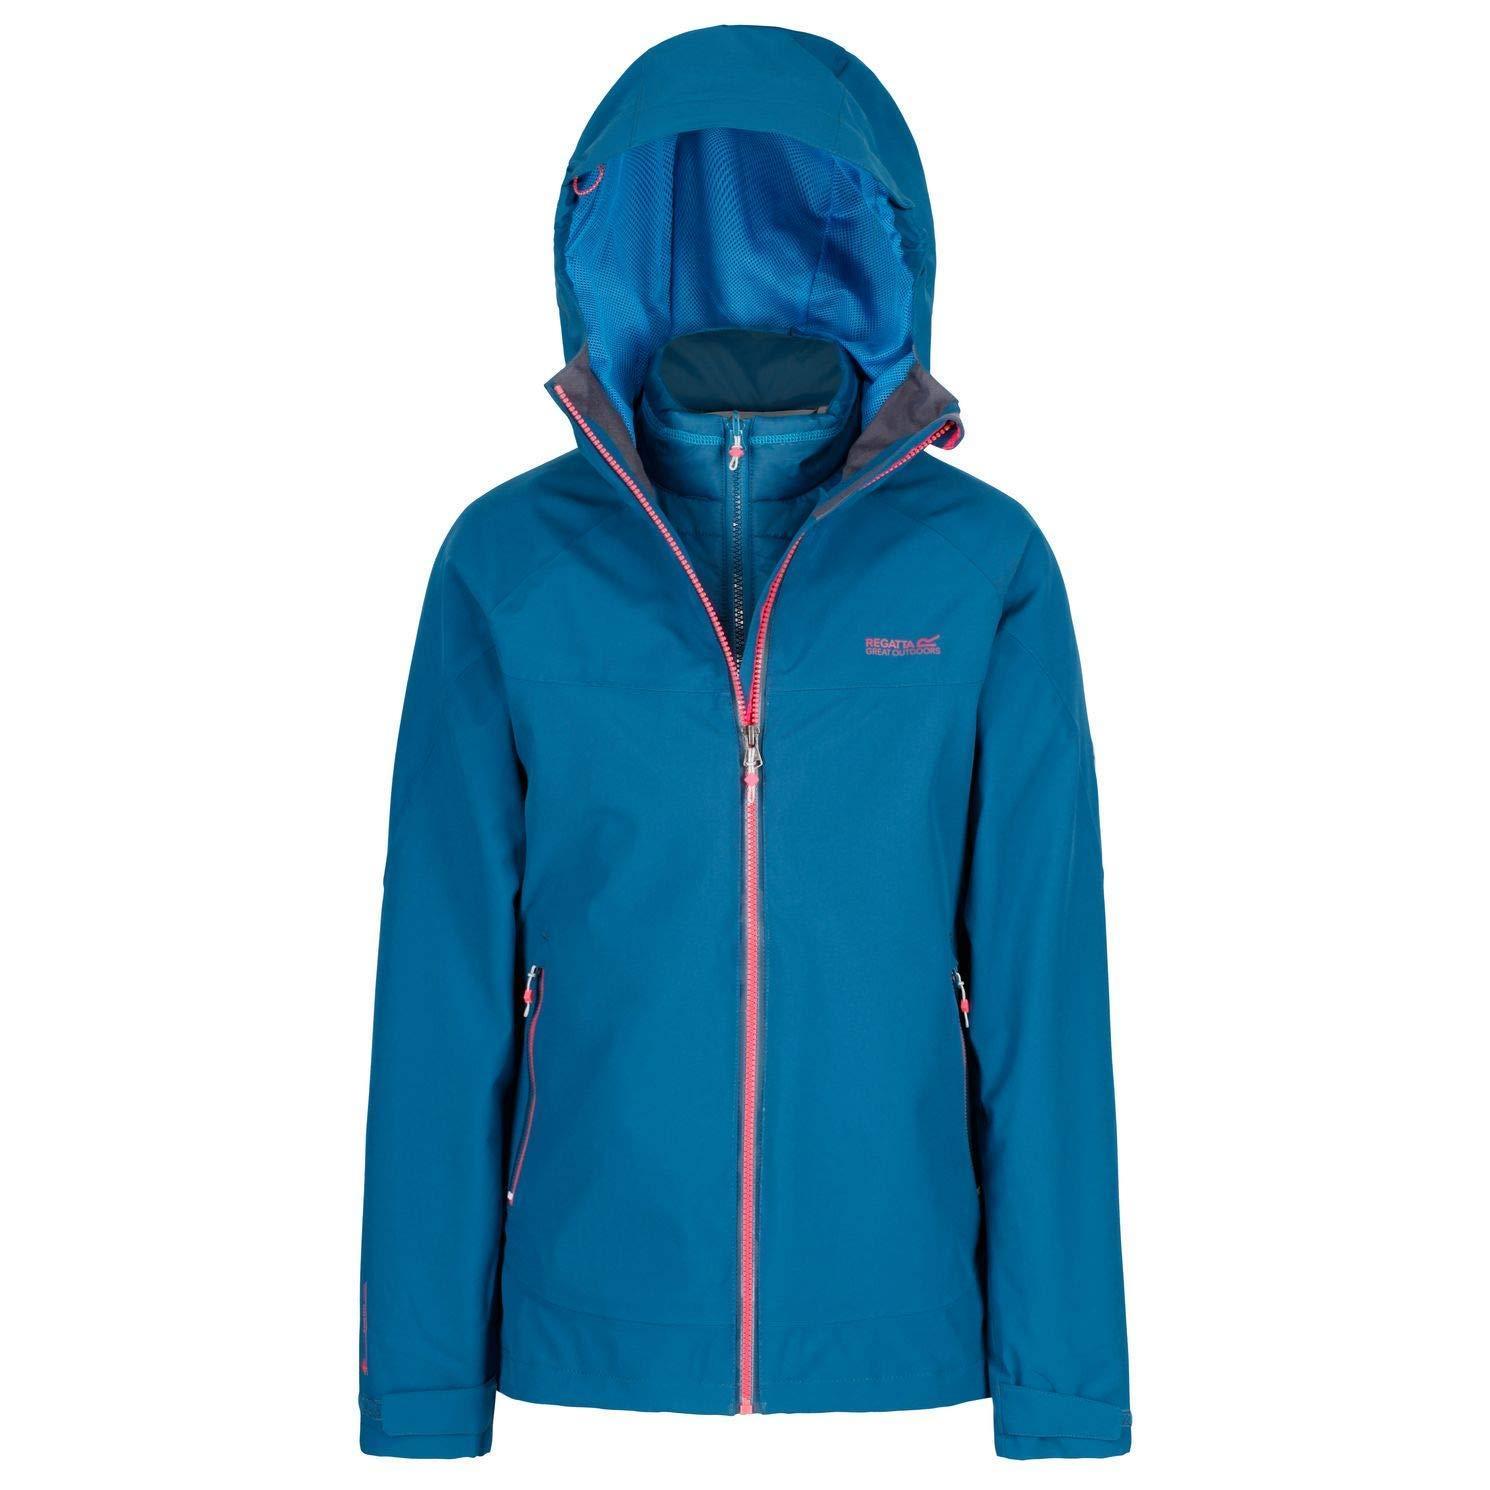 Regatta Womens/Ladies Wentwood III Hooded Jacket (UK Size 18) (Papyrus White/Raspberry Red)